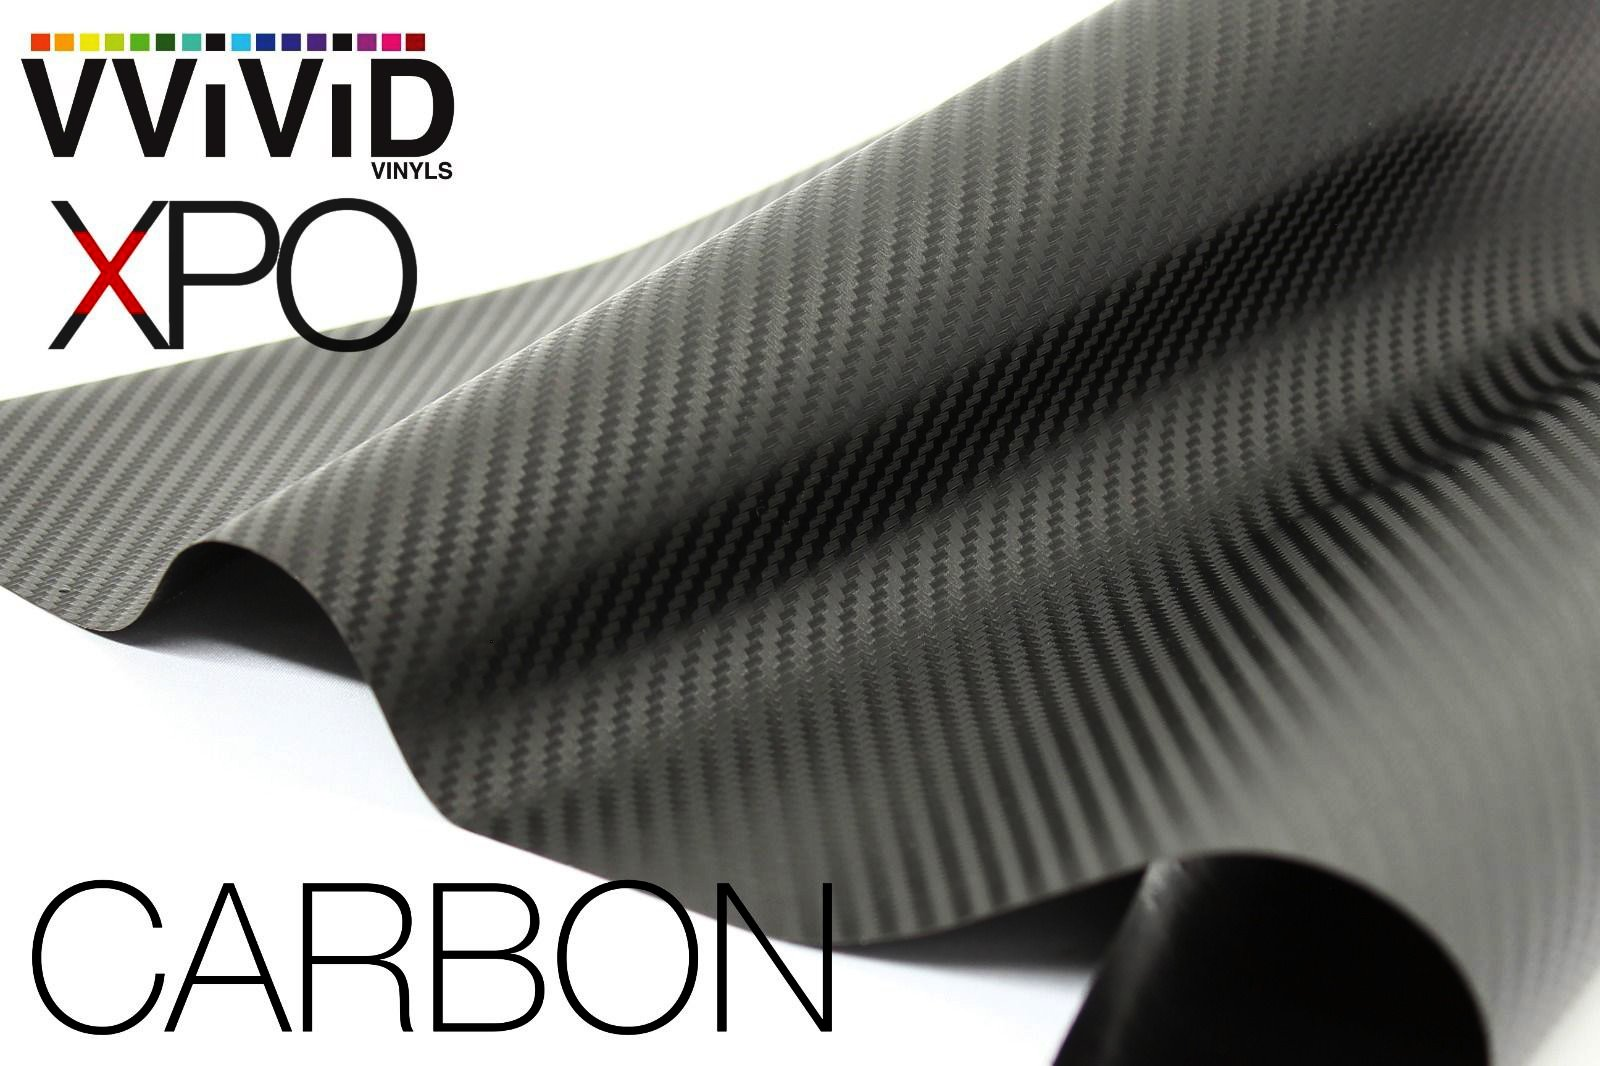 VViViD XPO Black Carbon Fiber Car Wrap Vinyl Roll Featuring Air Release Technology (6ft x 5ft)